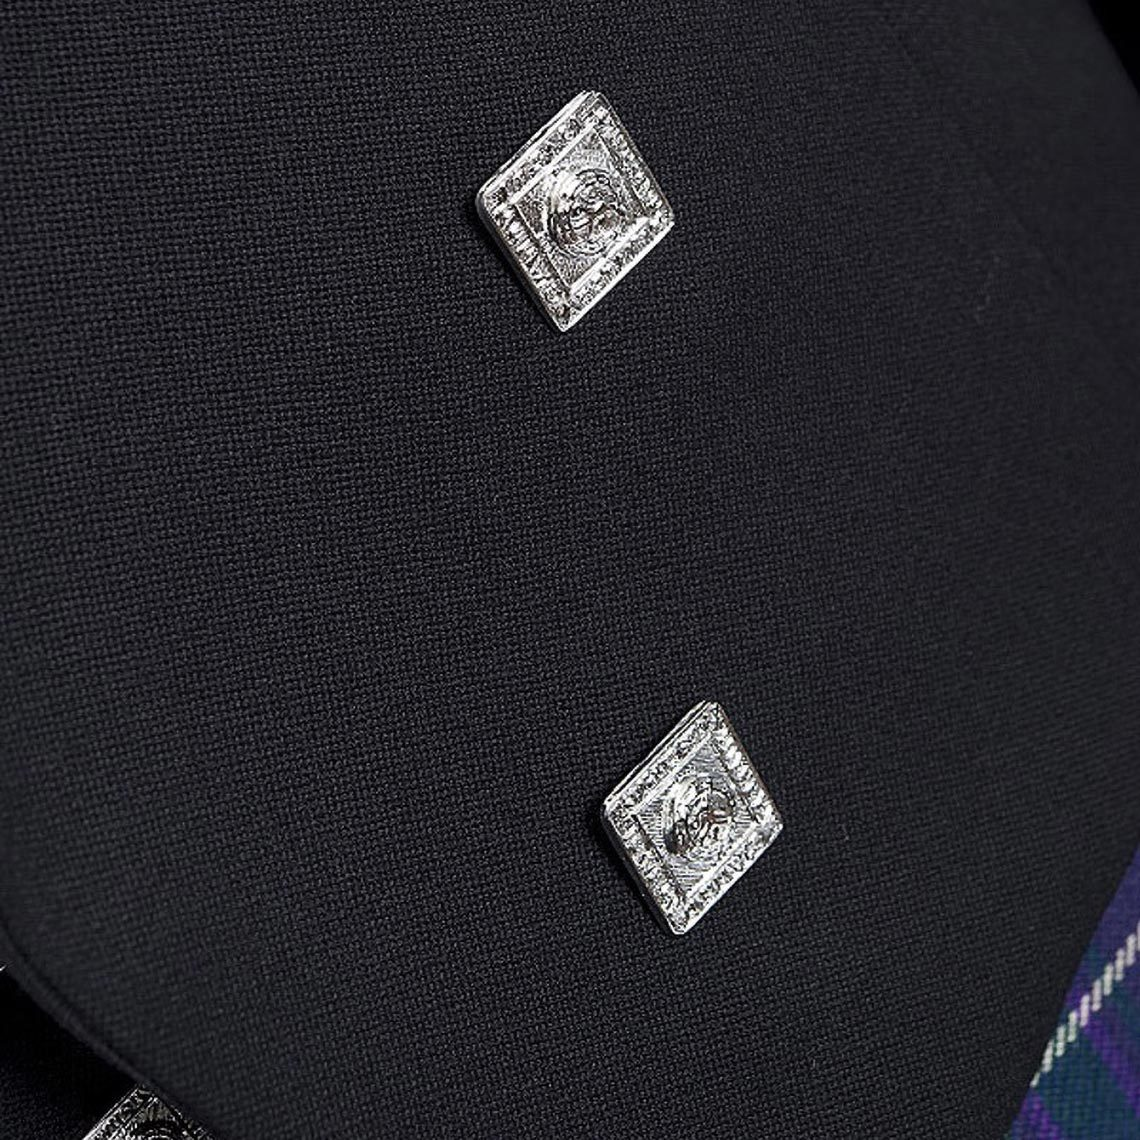 Black Oban Prince Charlie Jacket & Waistcoat